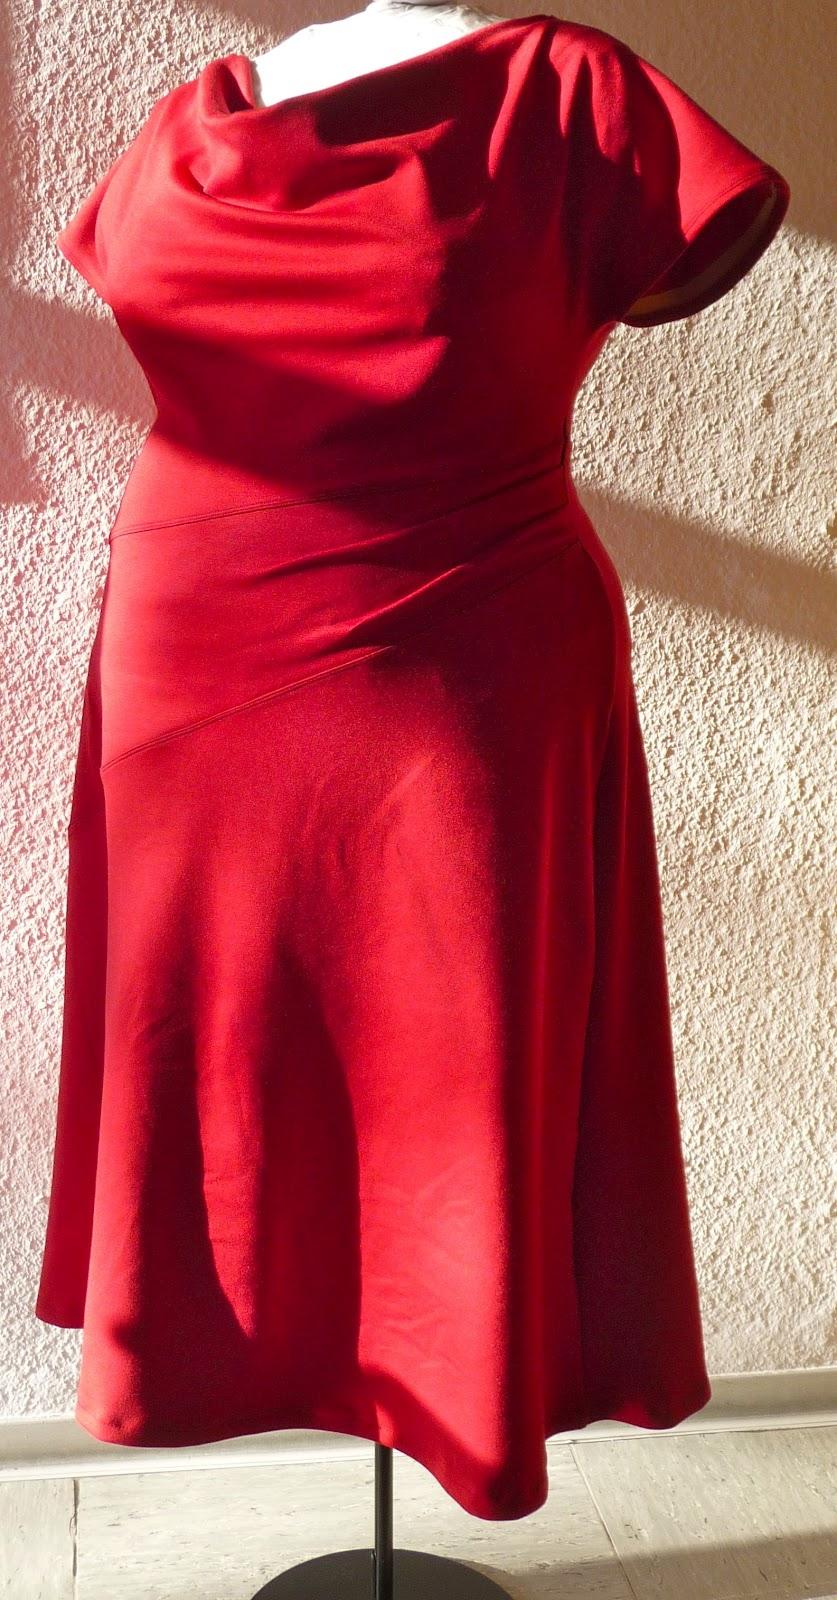 Rotes kleid selber nahen